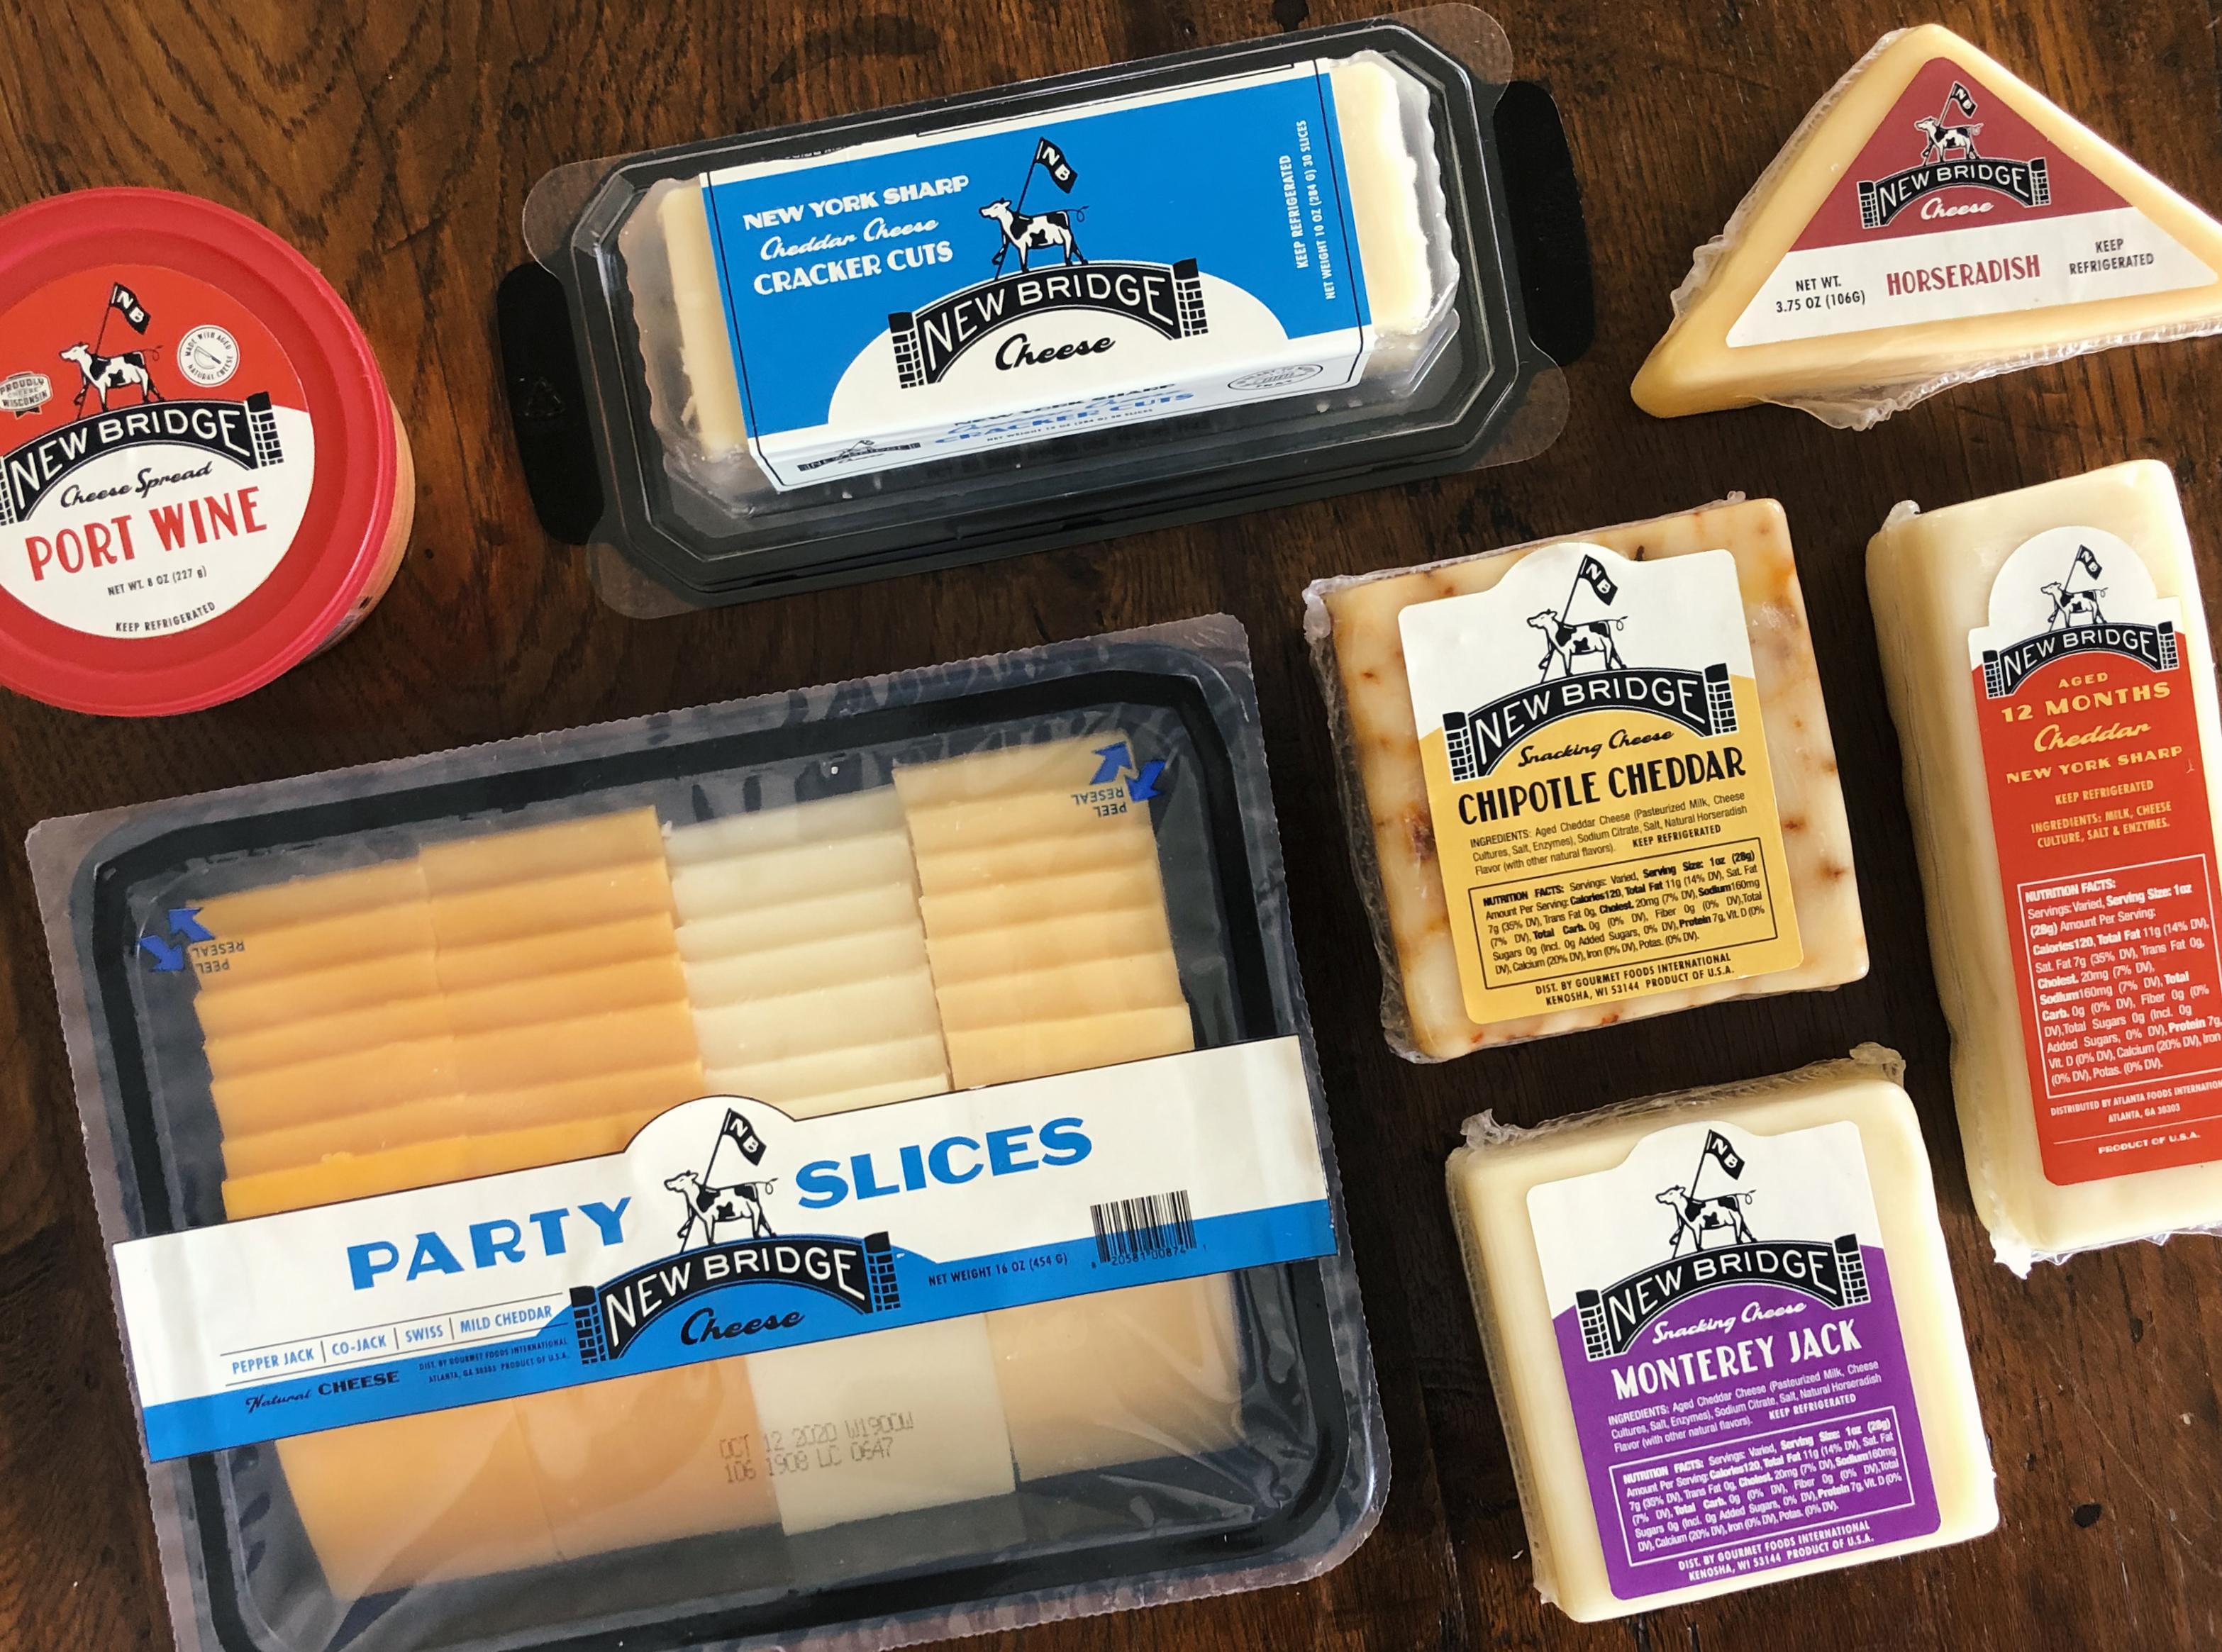 photo-2-guideline-new-bridge-cheese-design-exploration-zeki-michael-design-cheese-cow-spread-tub-sku-range-agency-branding copy